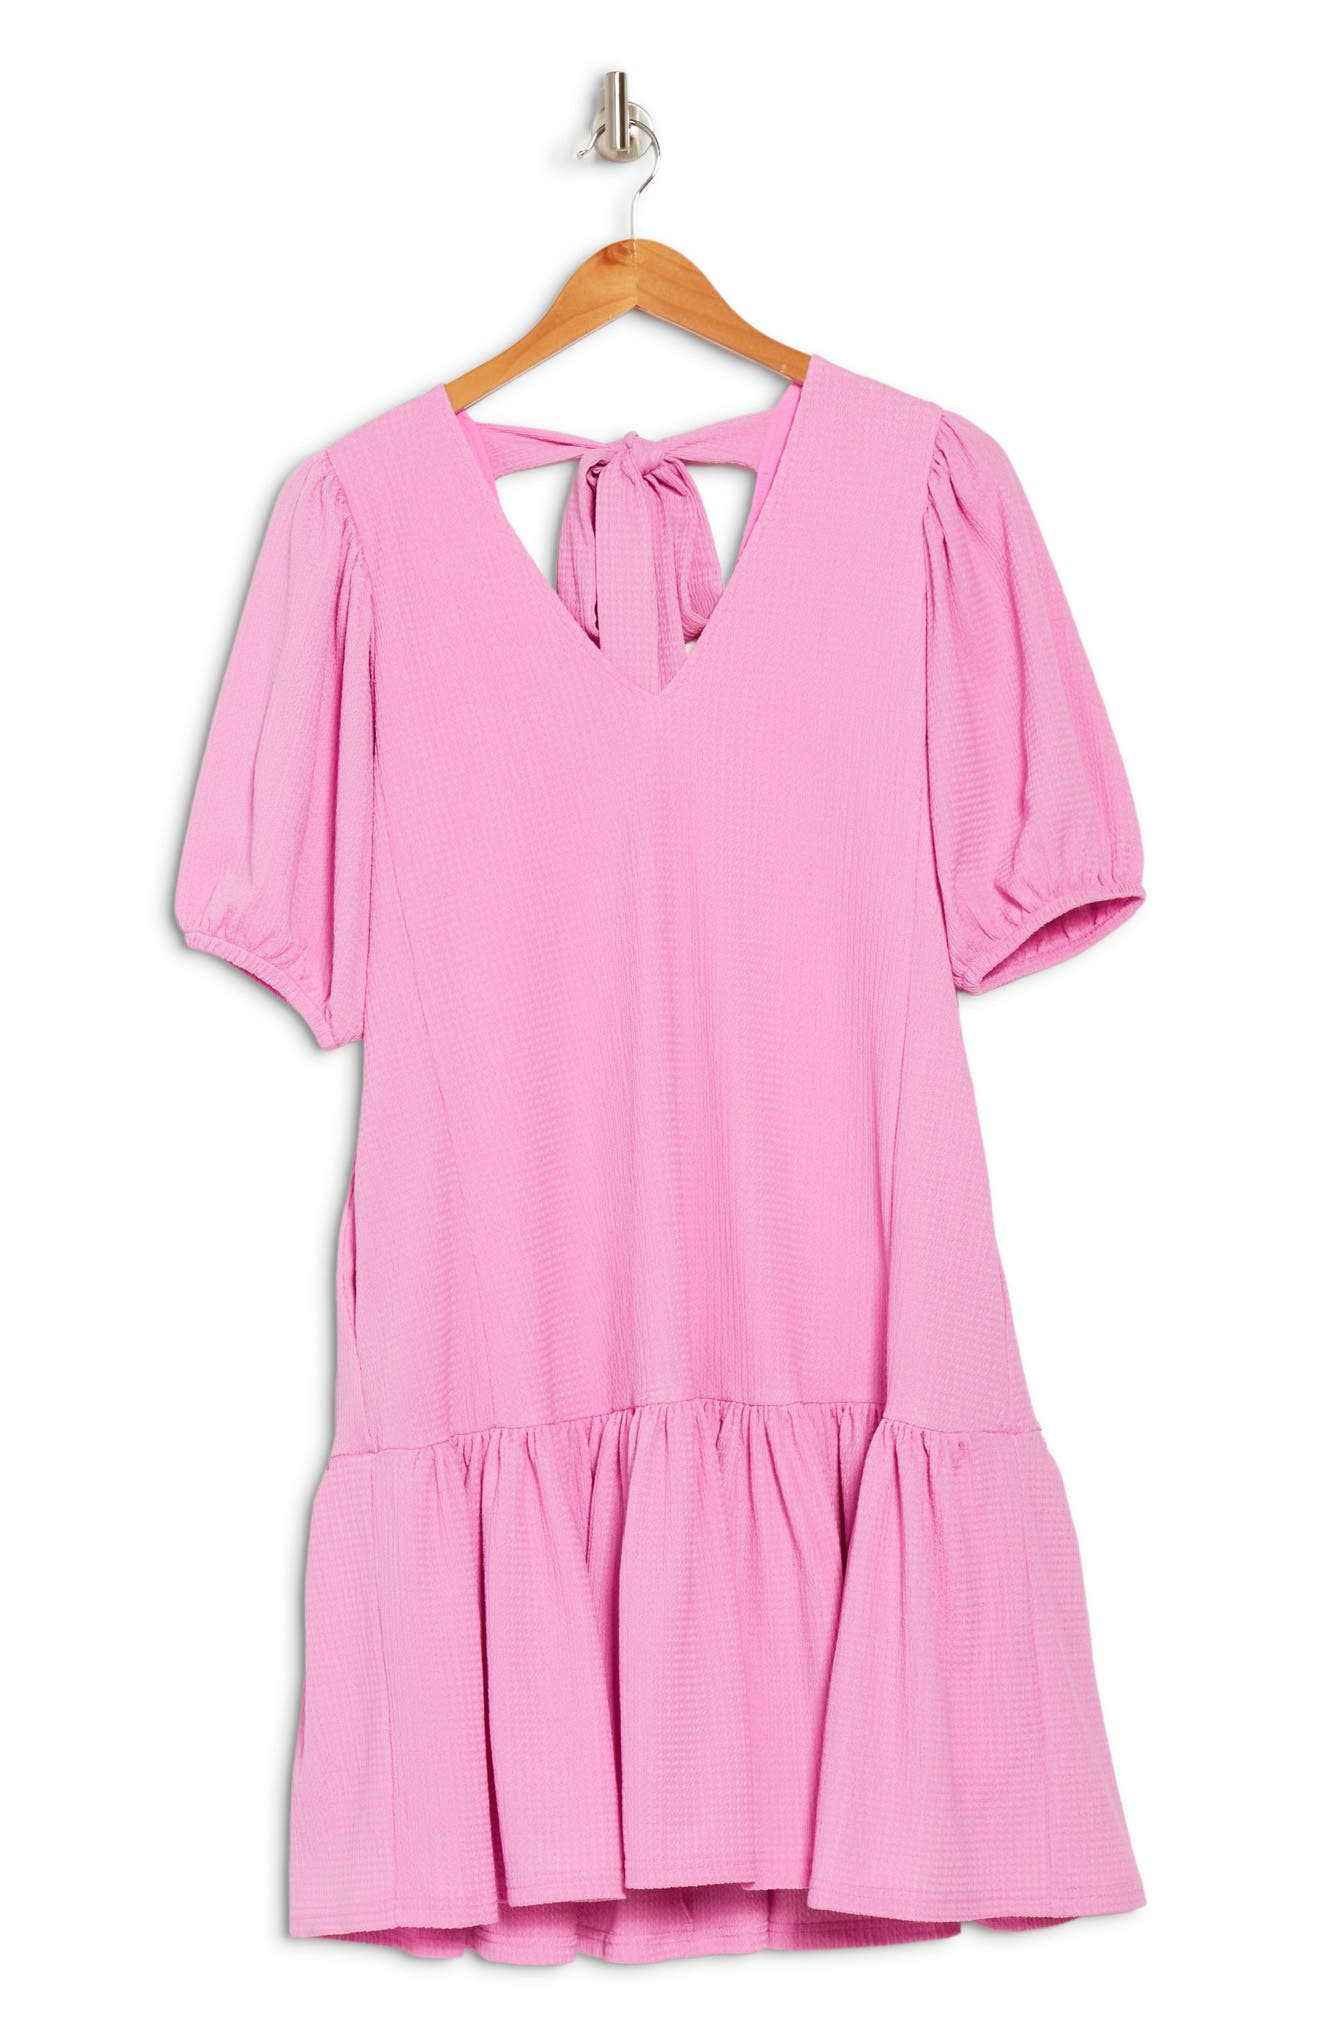 Melloday Puff Volume Sleeve Ruffle Hem Dress In Rose